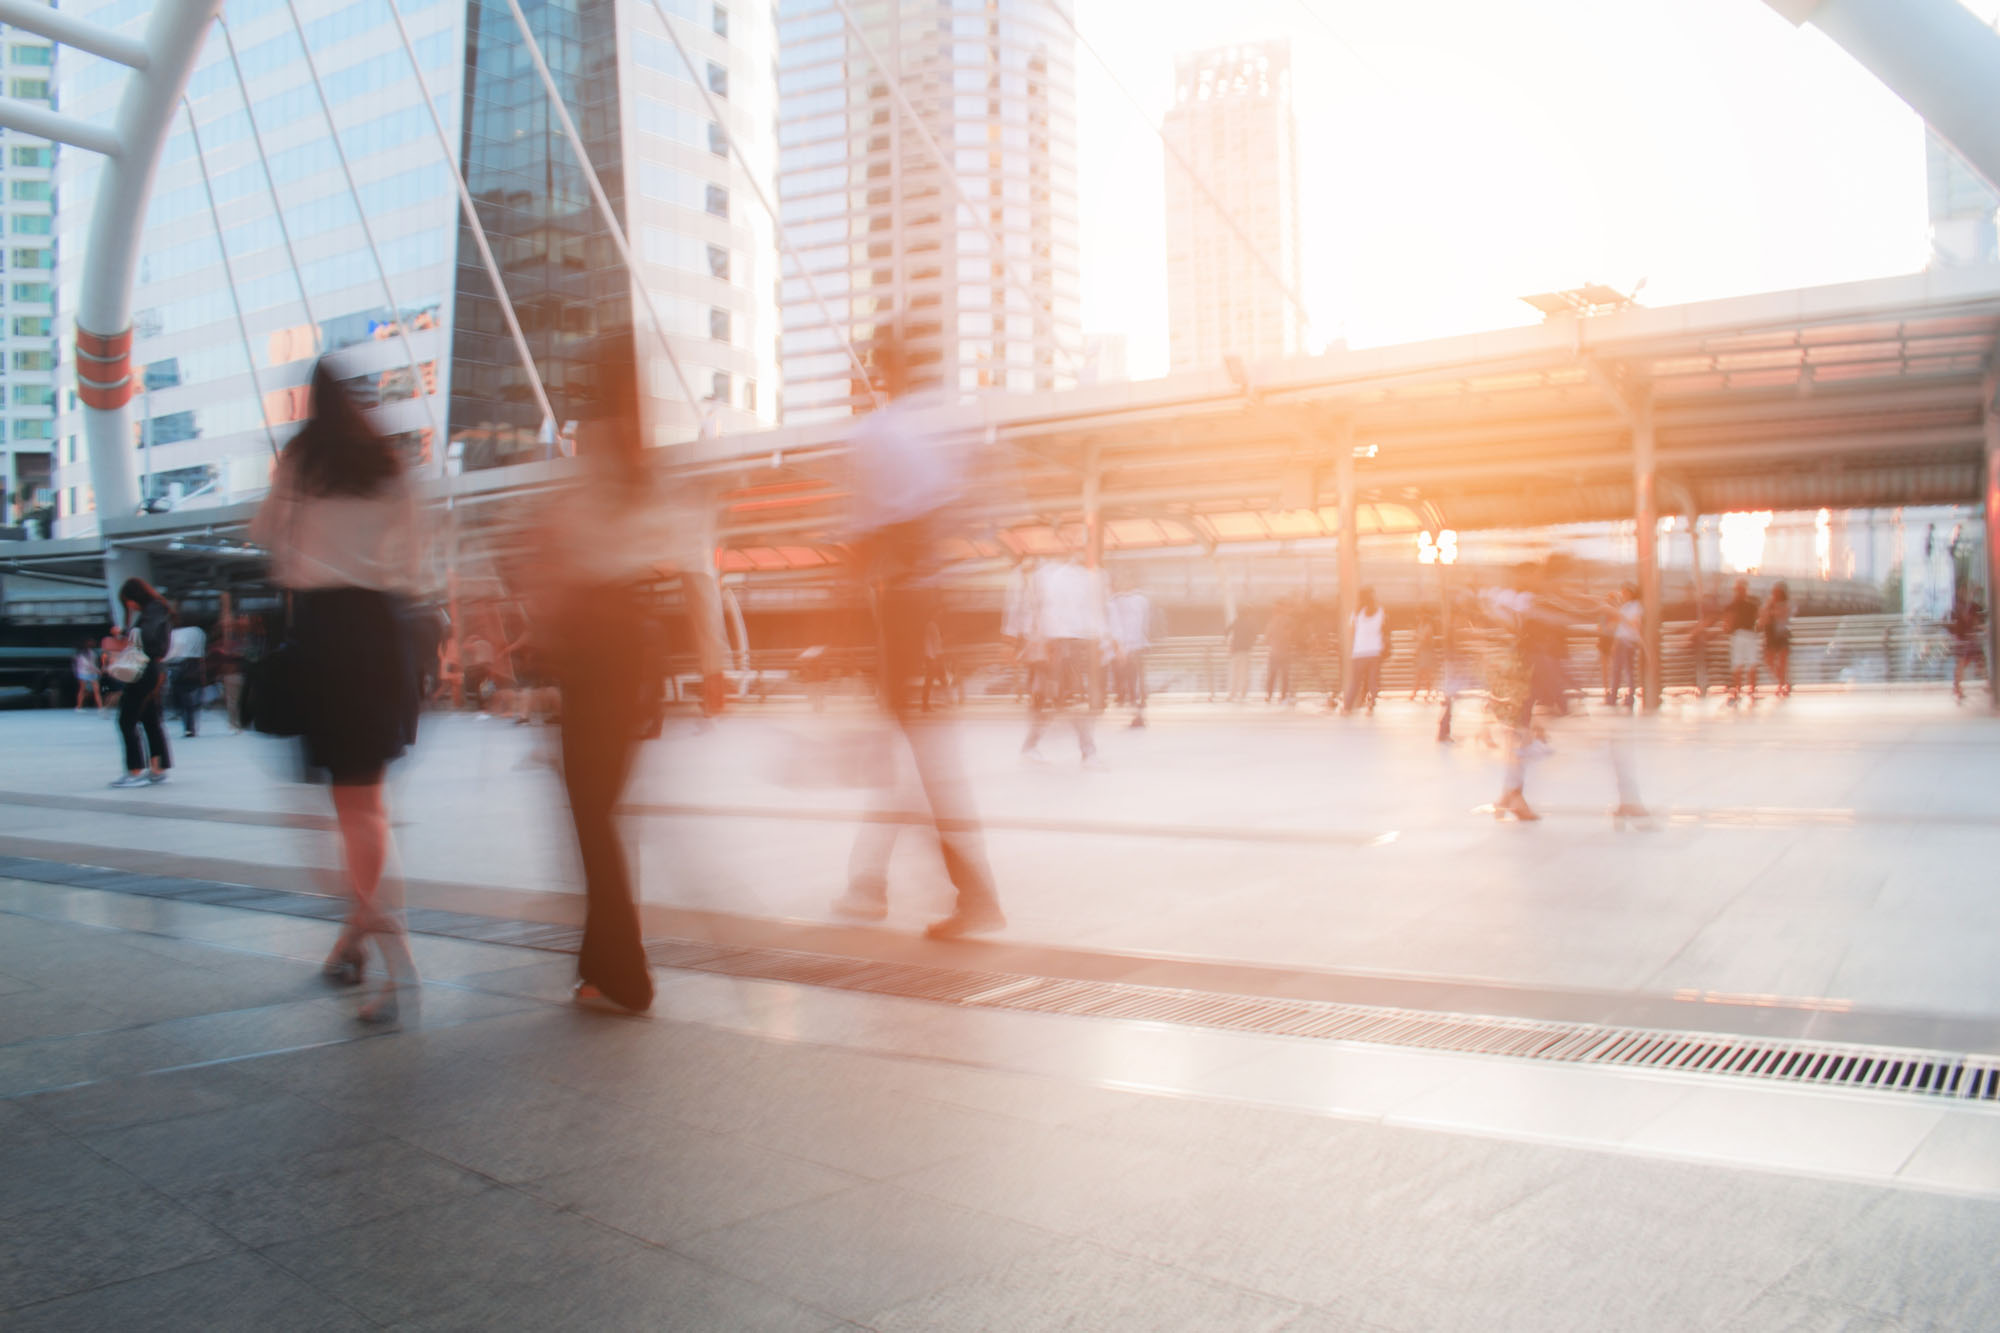 bright light behind pedestrians representing lunavi illuminating technology solutions